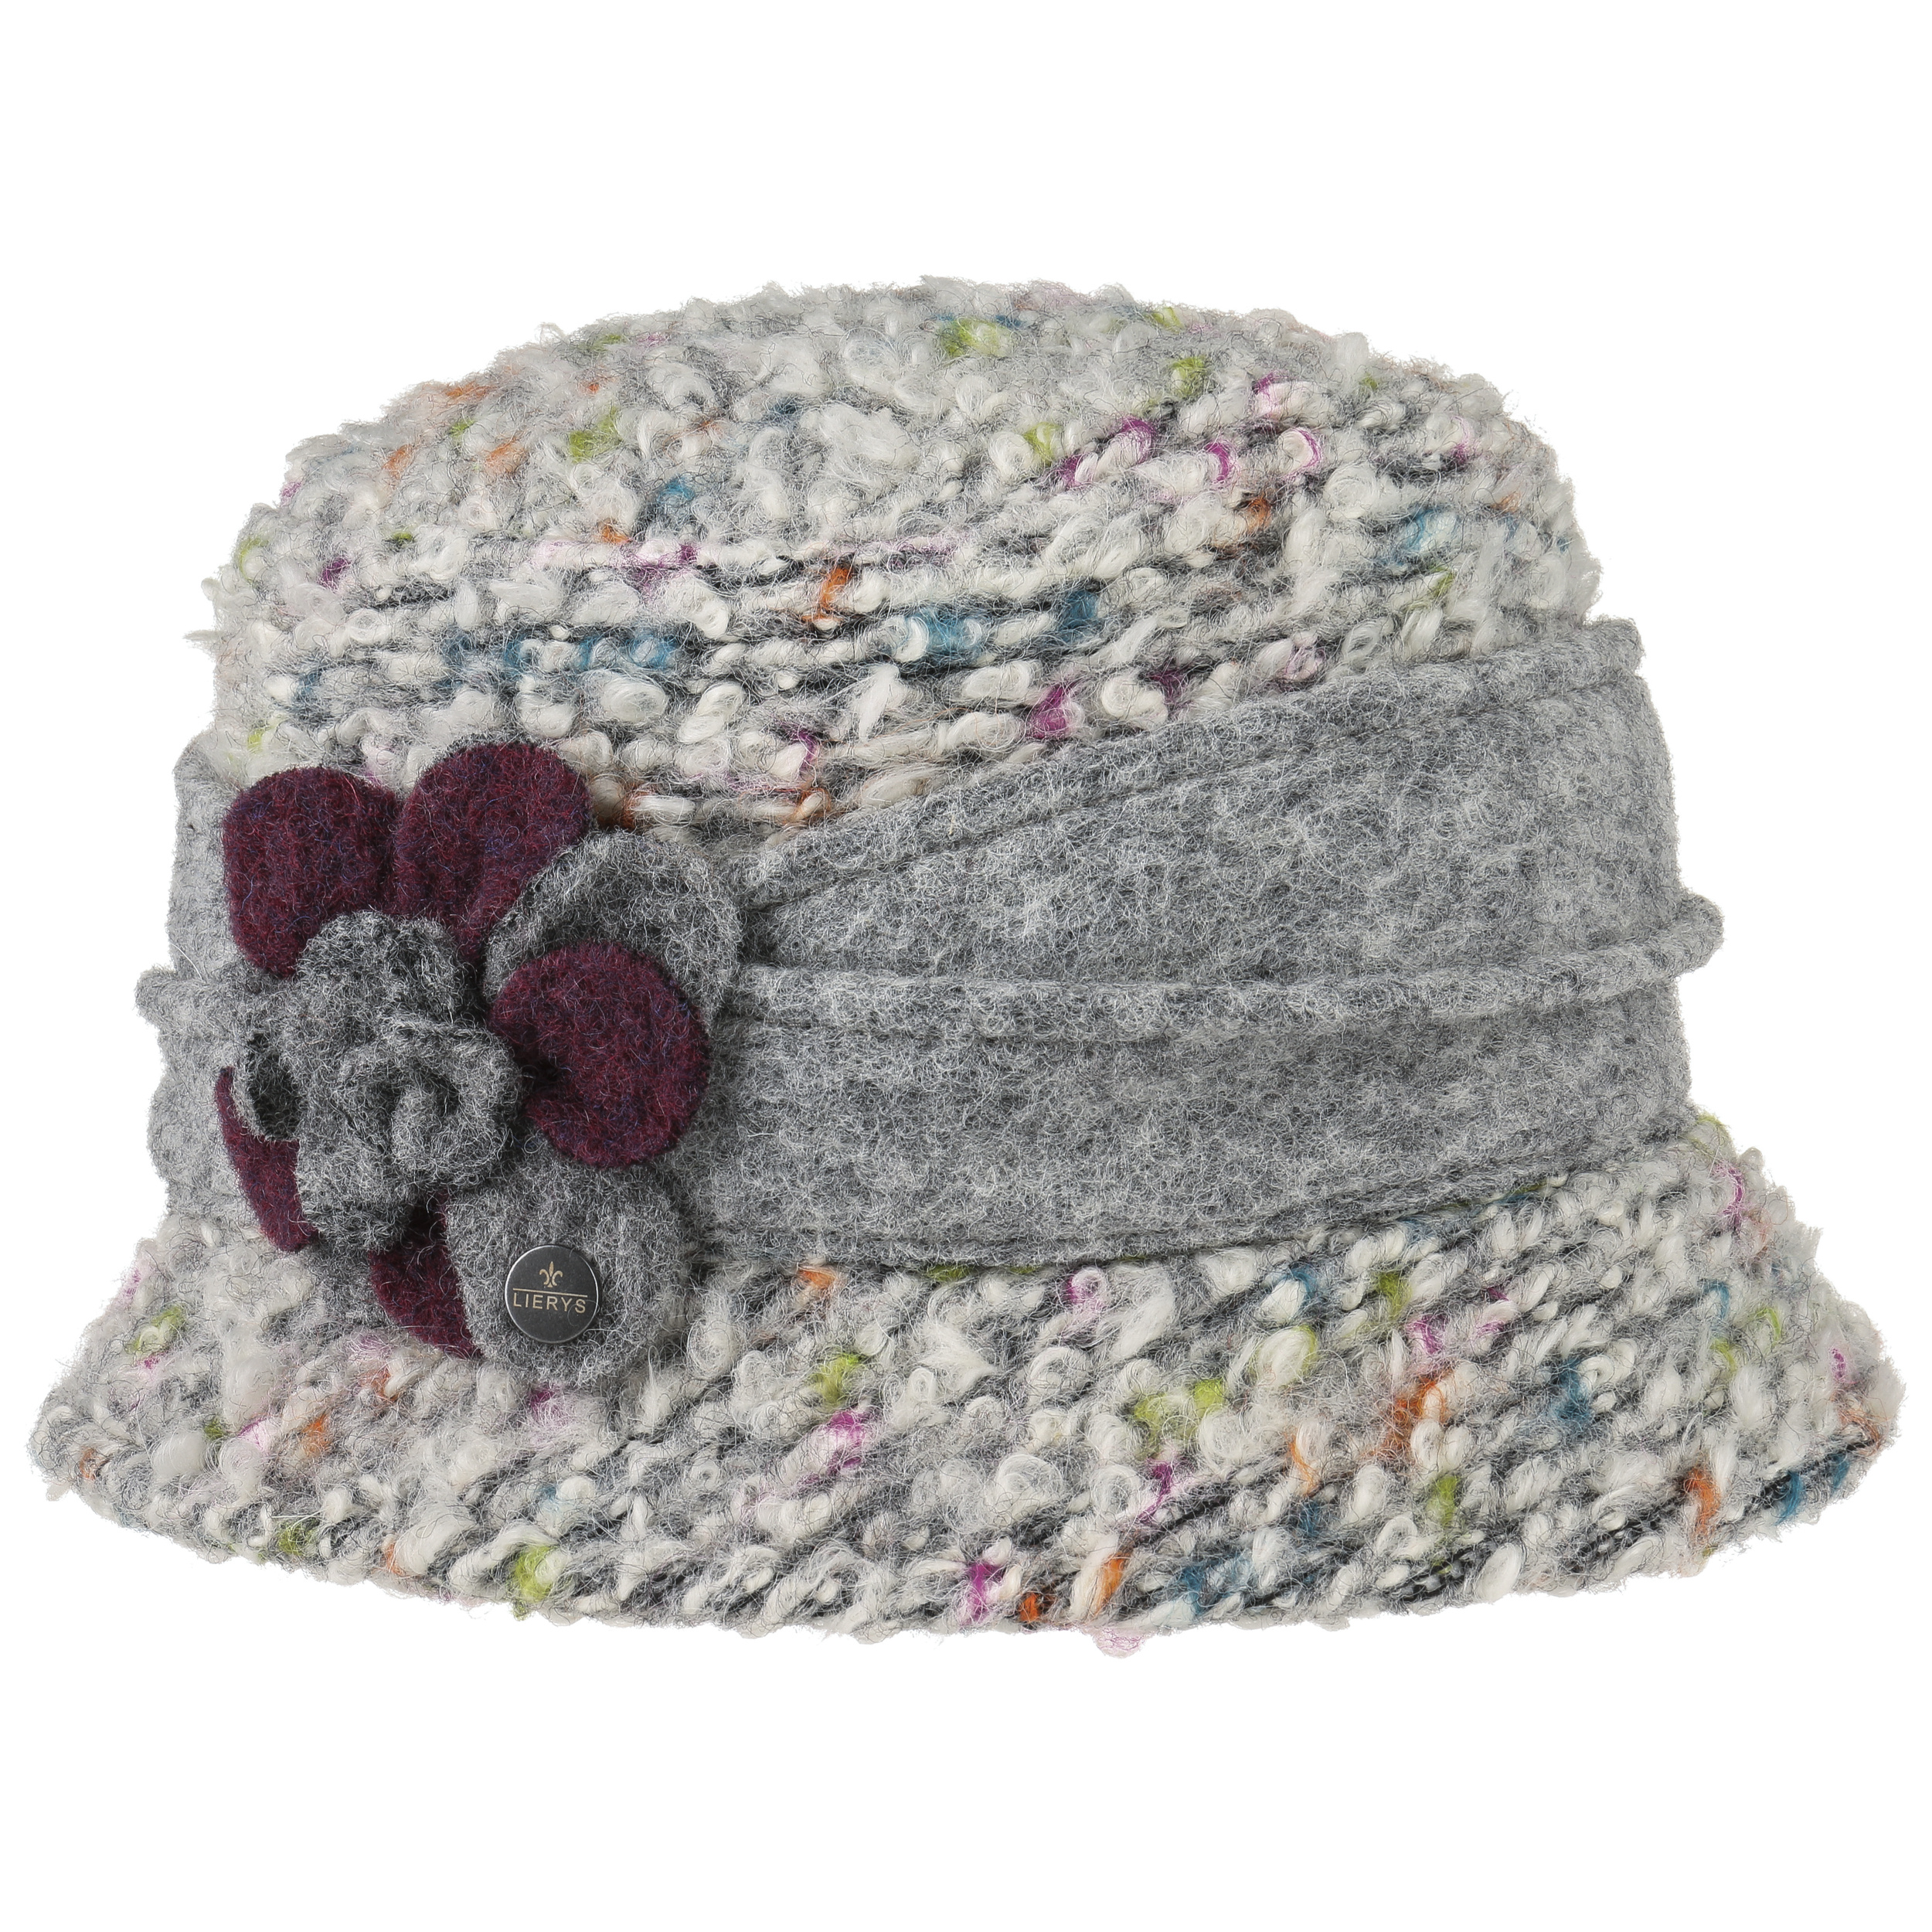 616260061e8cb Sombrero de Lana Colourtouch by Lierys - Sombreros - sombreroshop.es